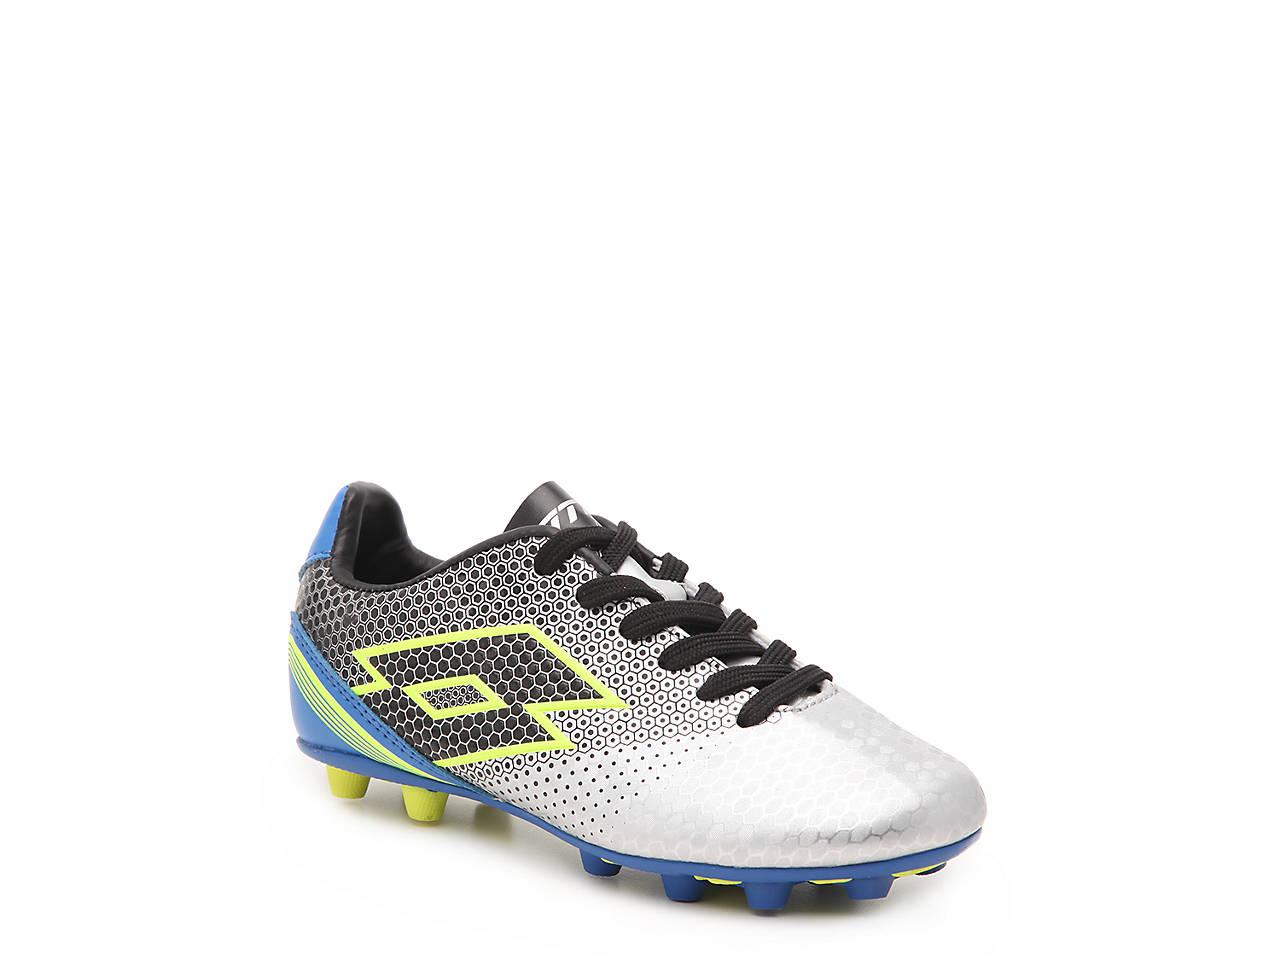 discount for sale discount price color brilliancy Spectrum Elite Soccer Clear - Kids'